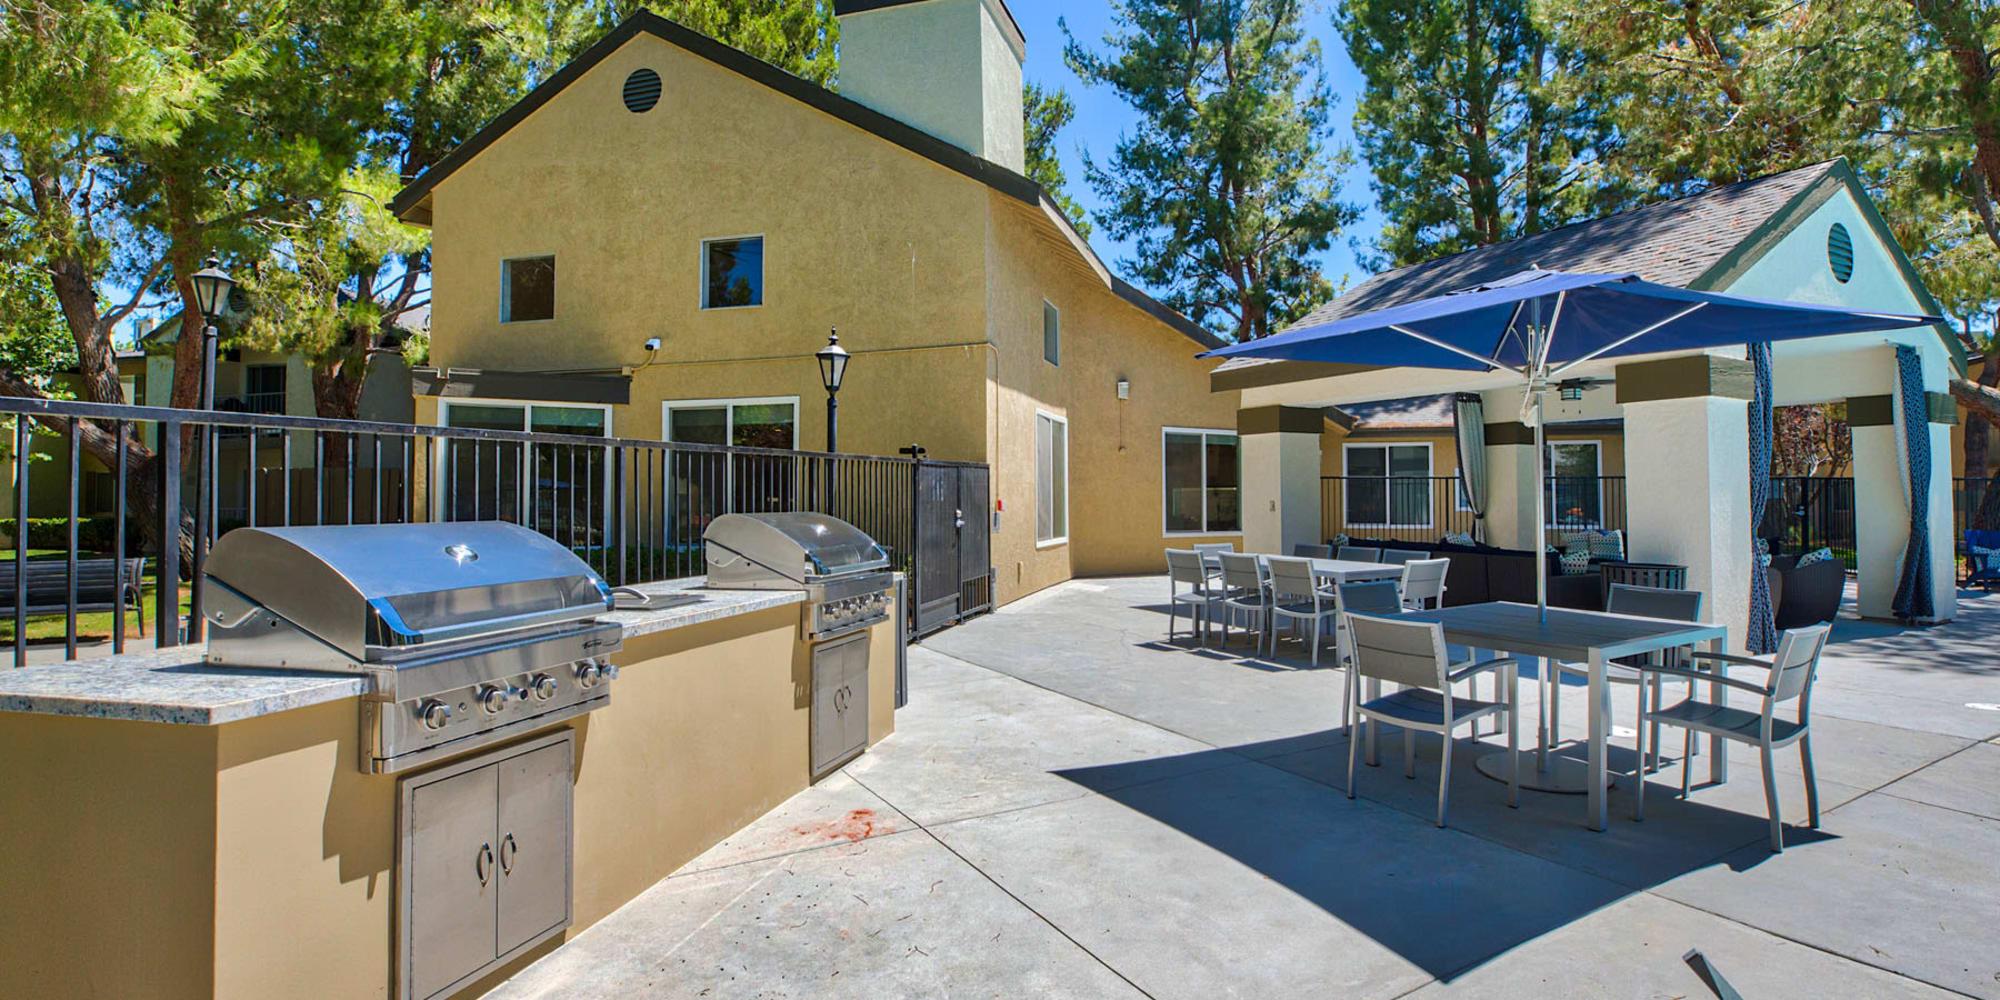 Gas barbecue grills near the picnic area at Mountain Vista in Victorville, California